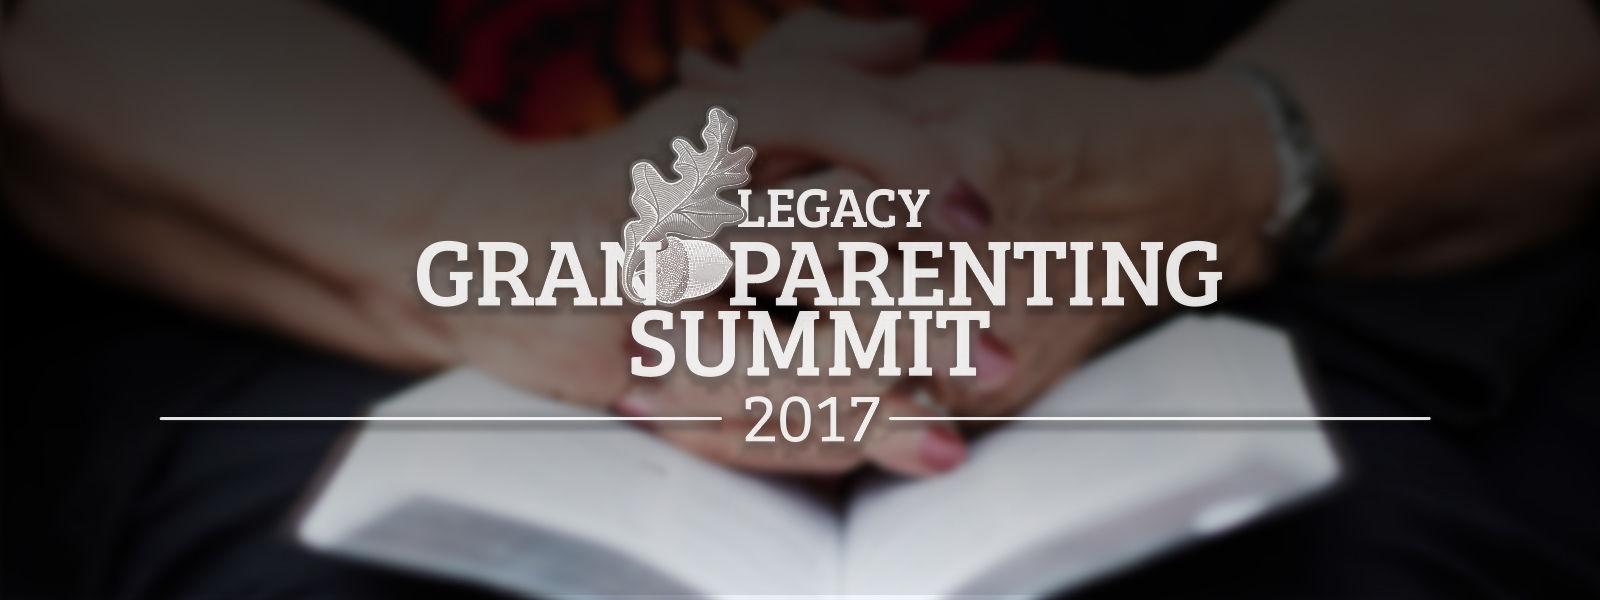 Legacy Grandparenting Summit 2017